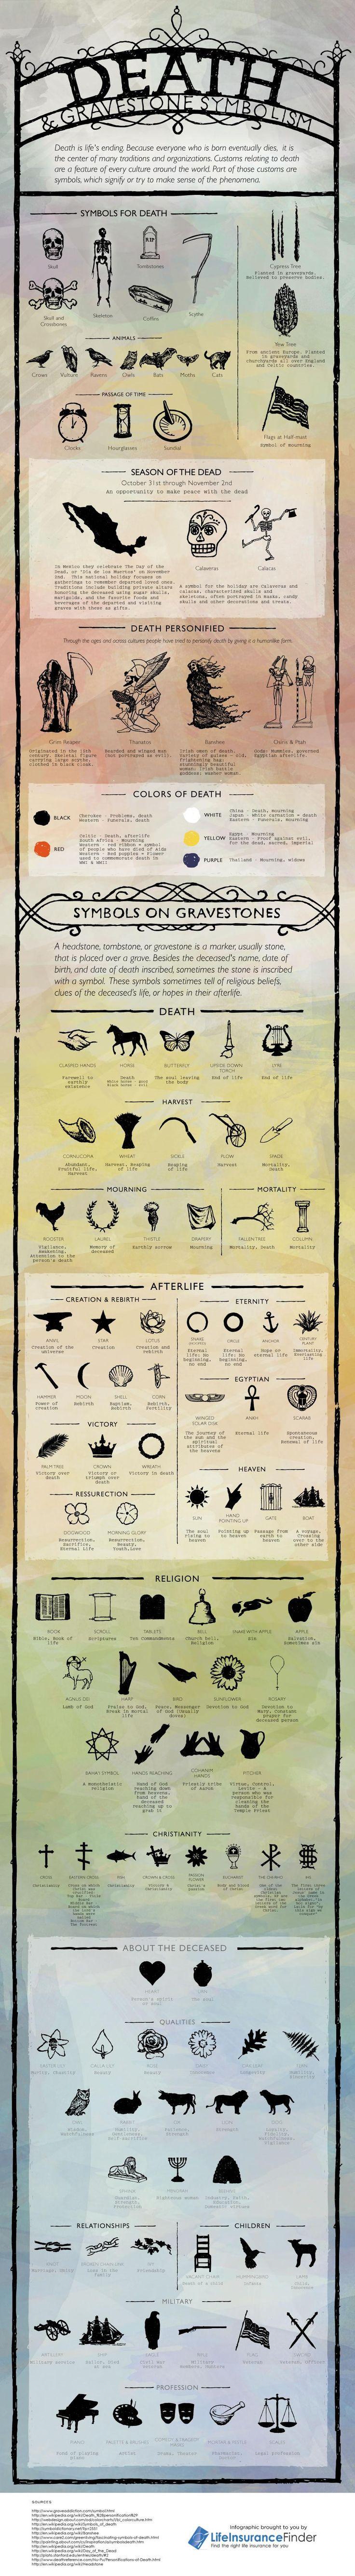 Death & graveyard symbolism | Halloween | Pinterest